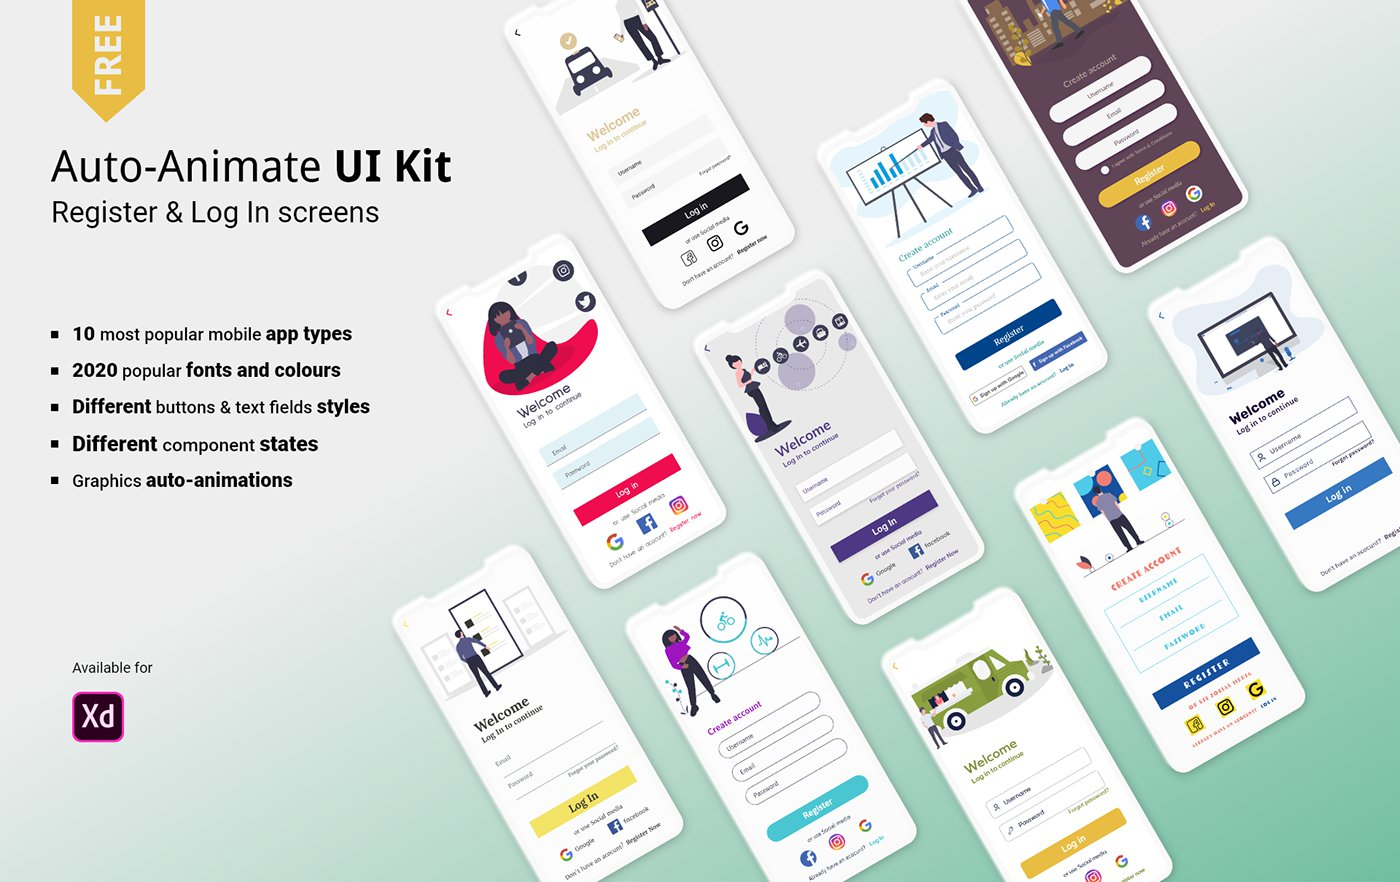 Free Auto-Animate Register & Login UI Kit for Adobe XD